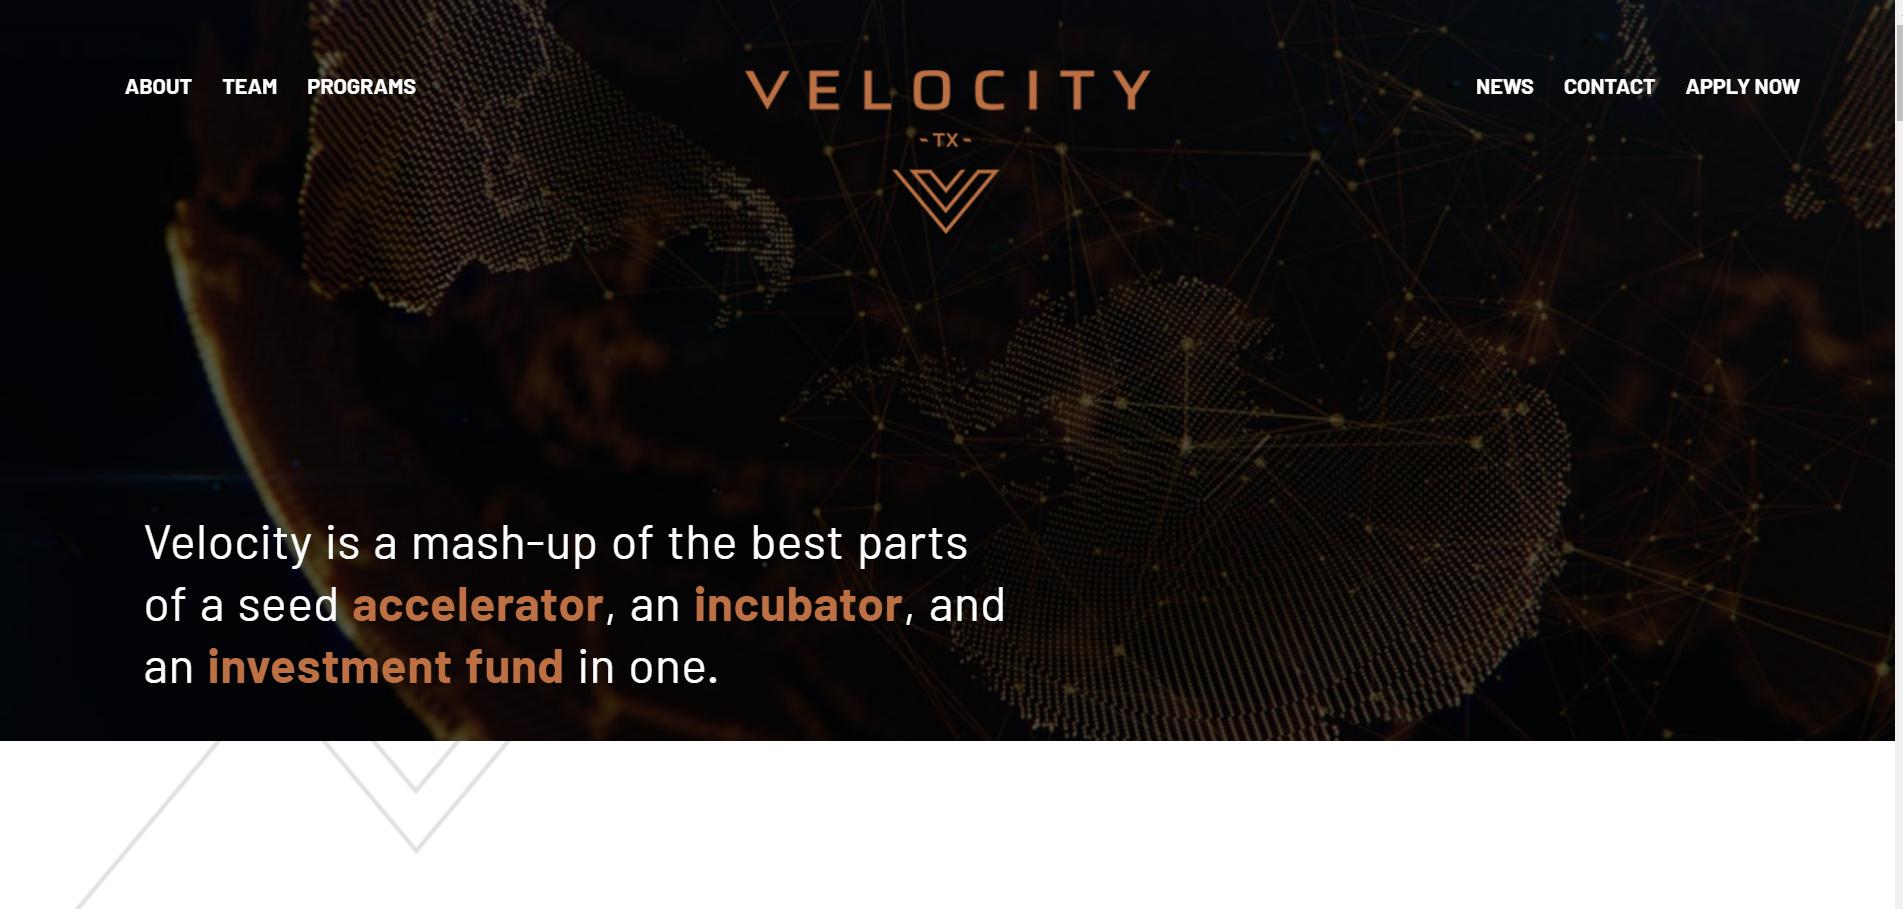 VelocityTX Announces New Leadership